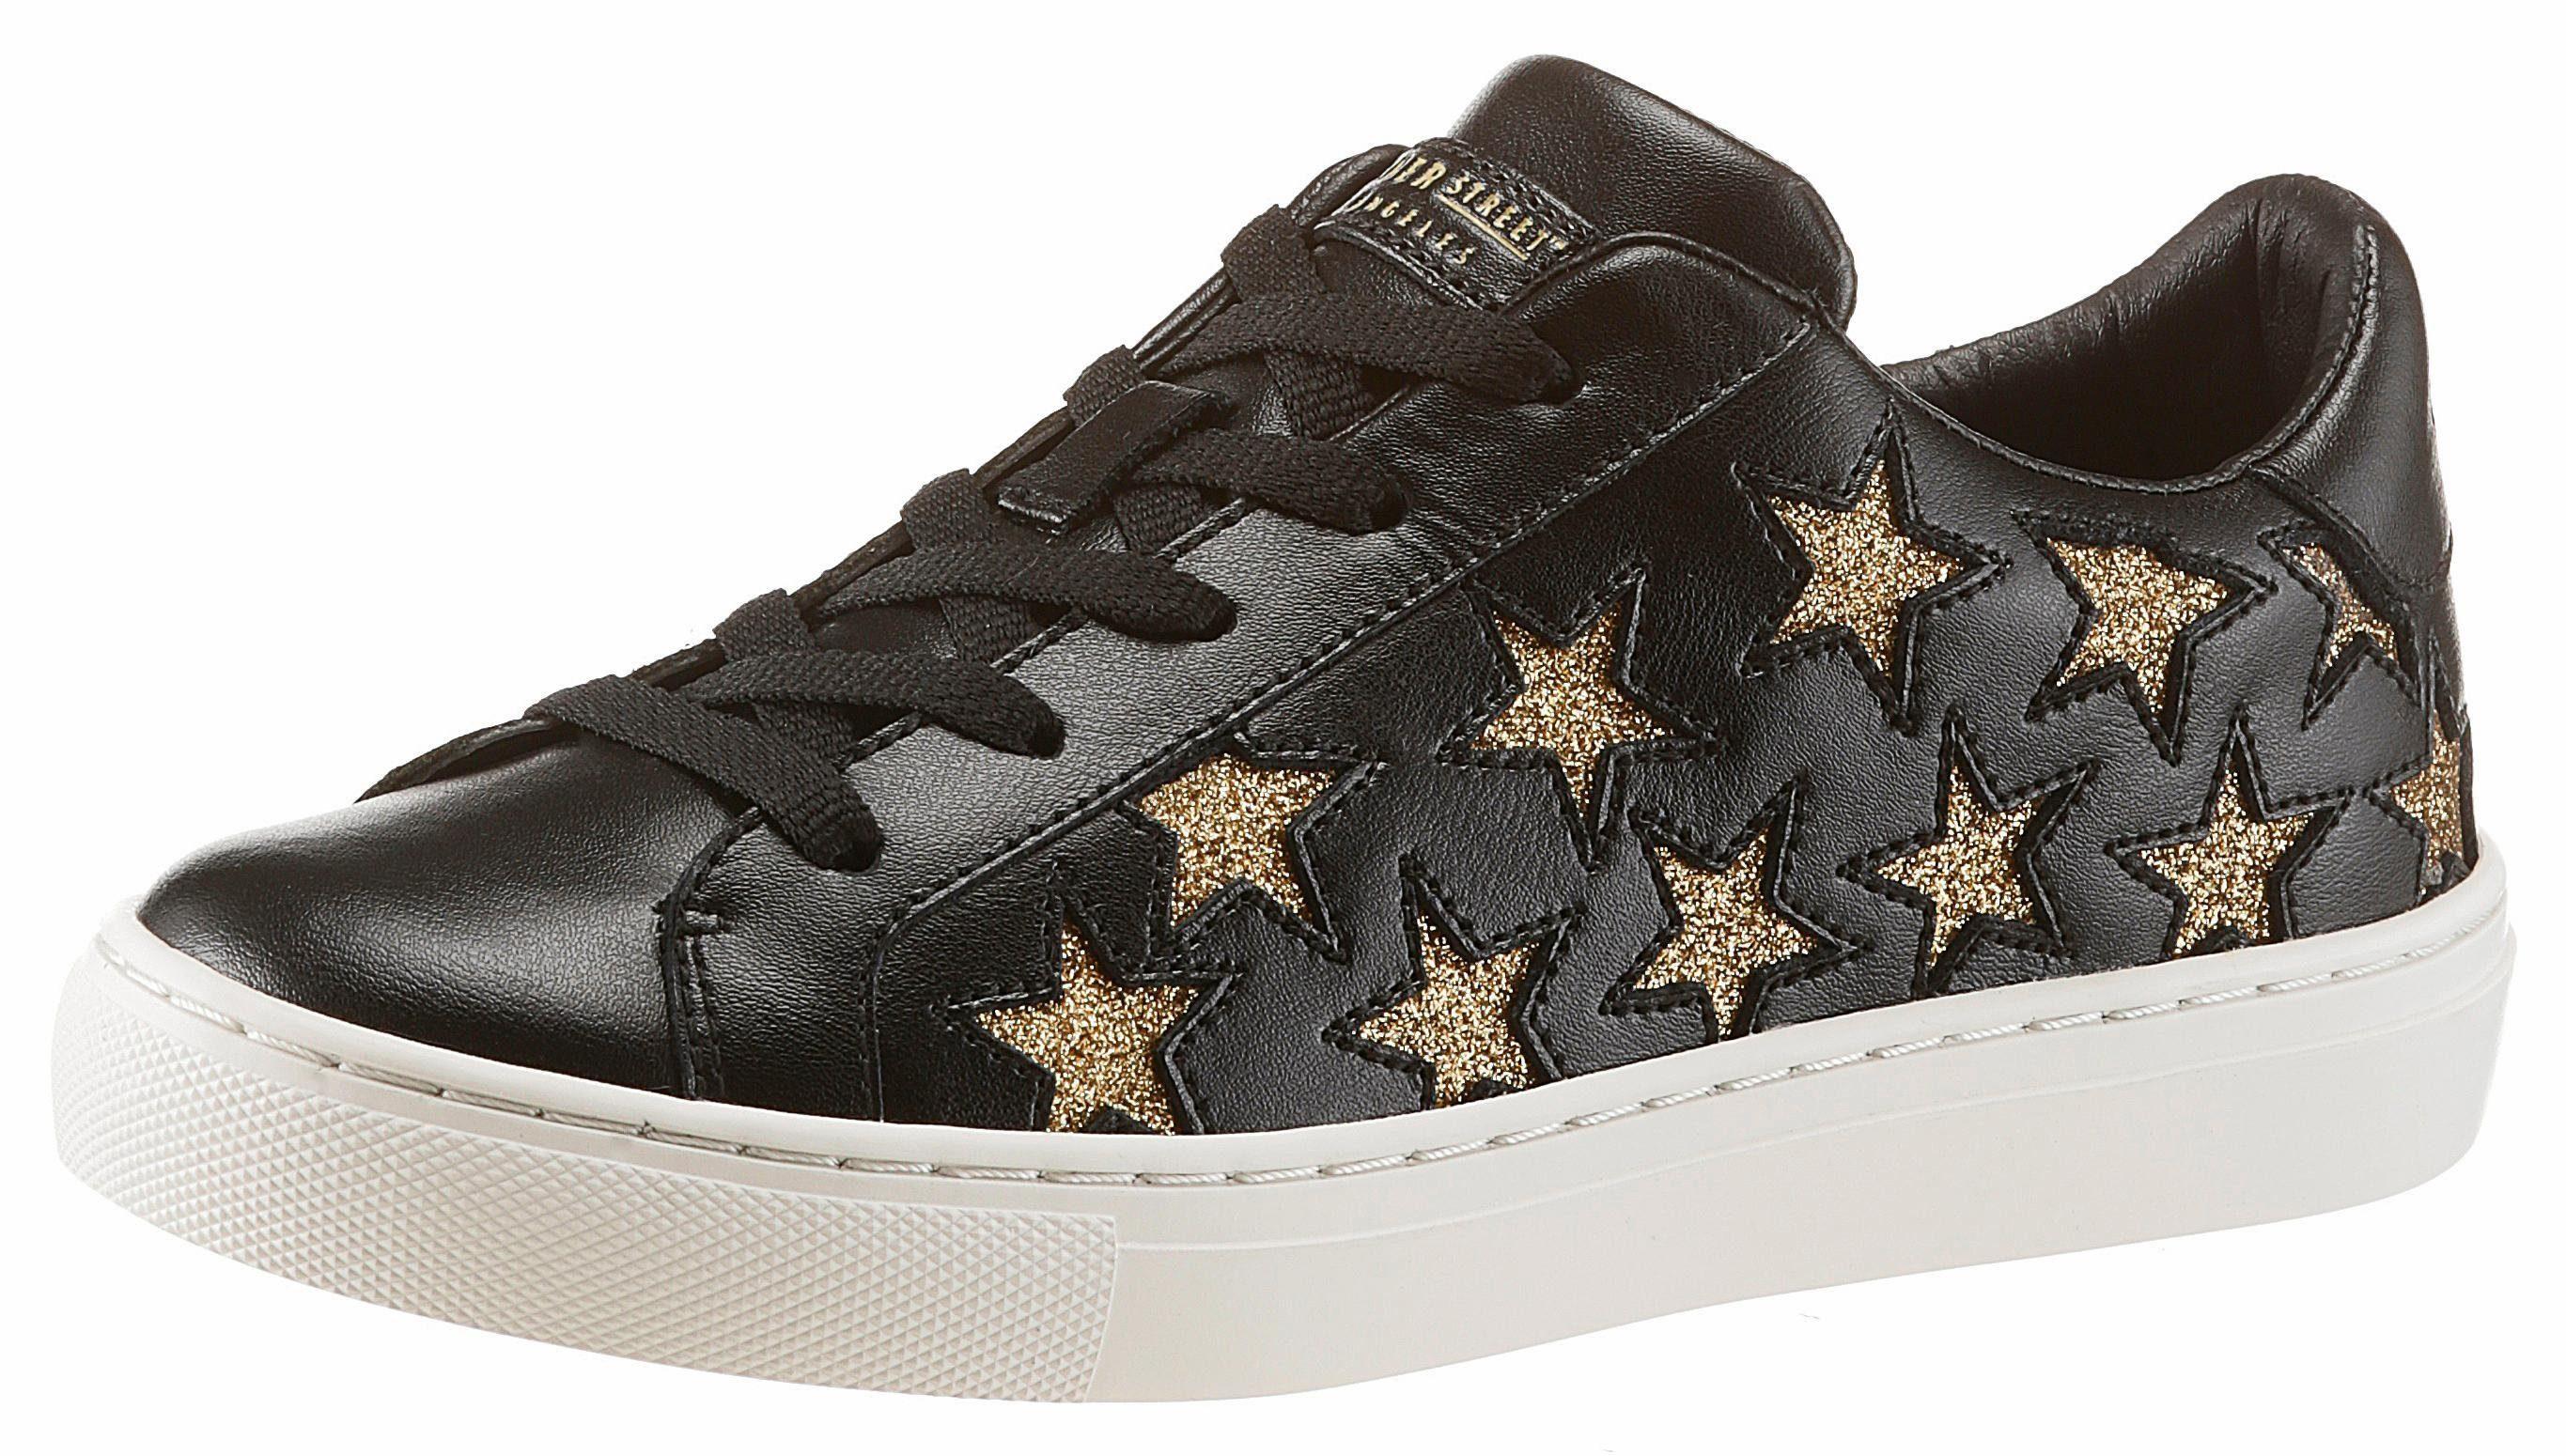 Skechers »Side Street - Star Side« Sneaker, mit trendigen Glitzersternchen, weiß, 36 36